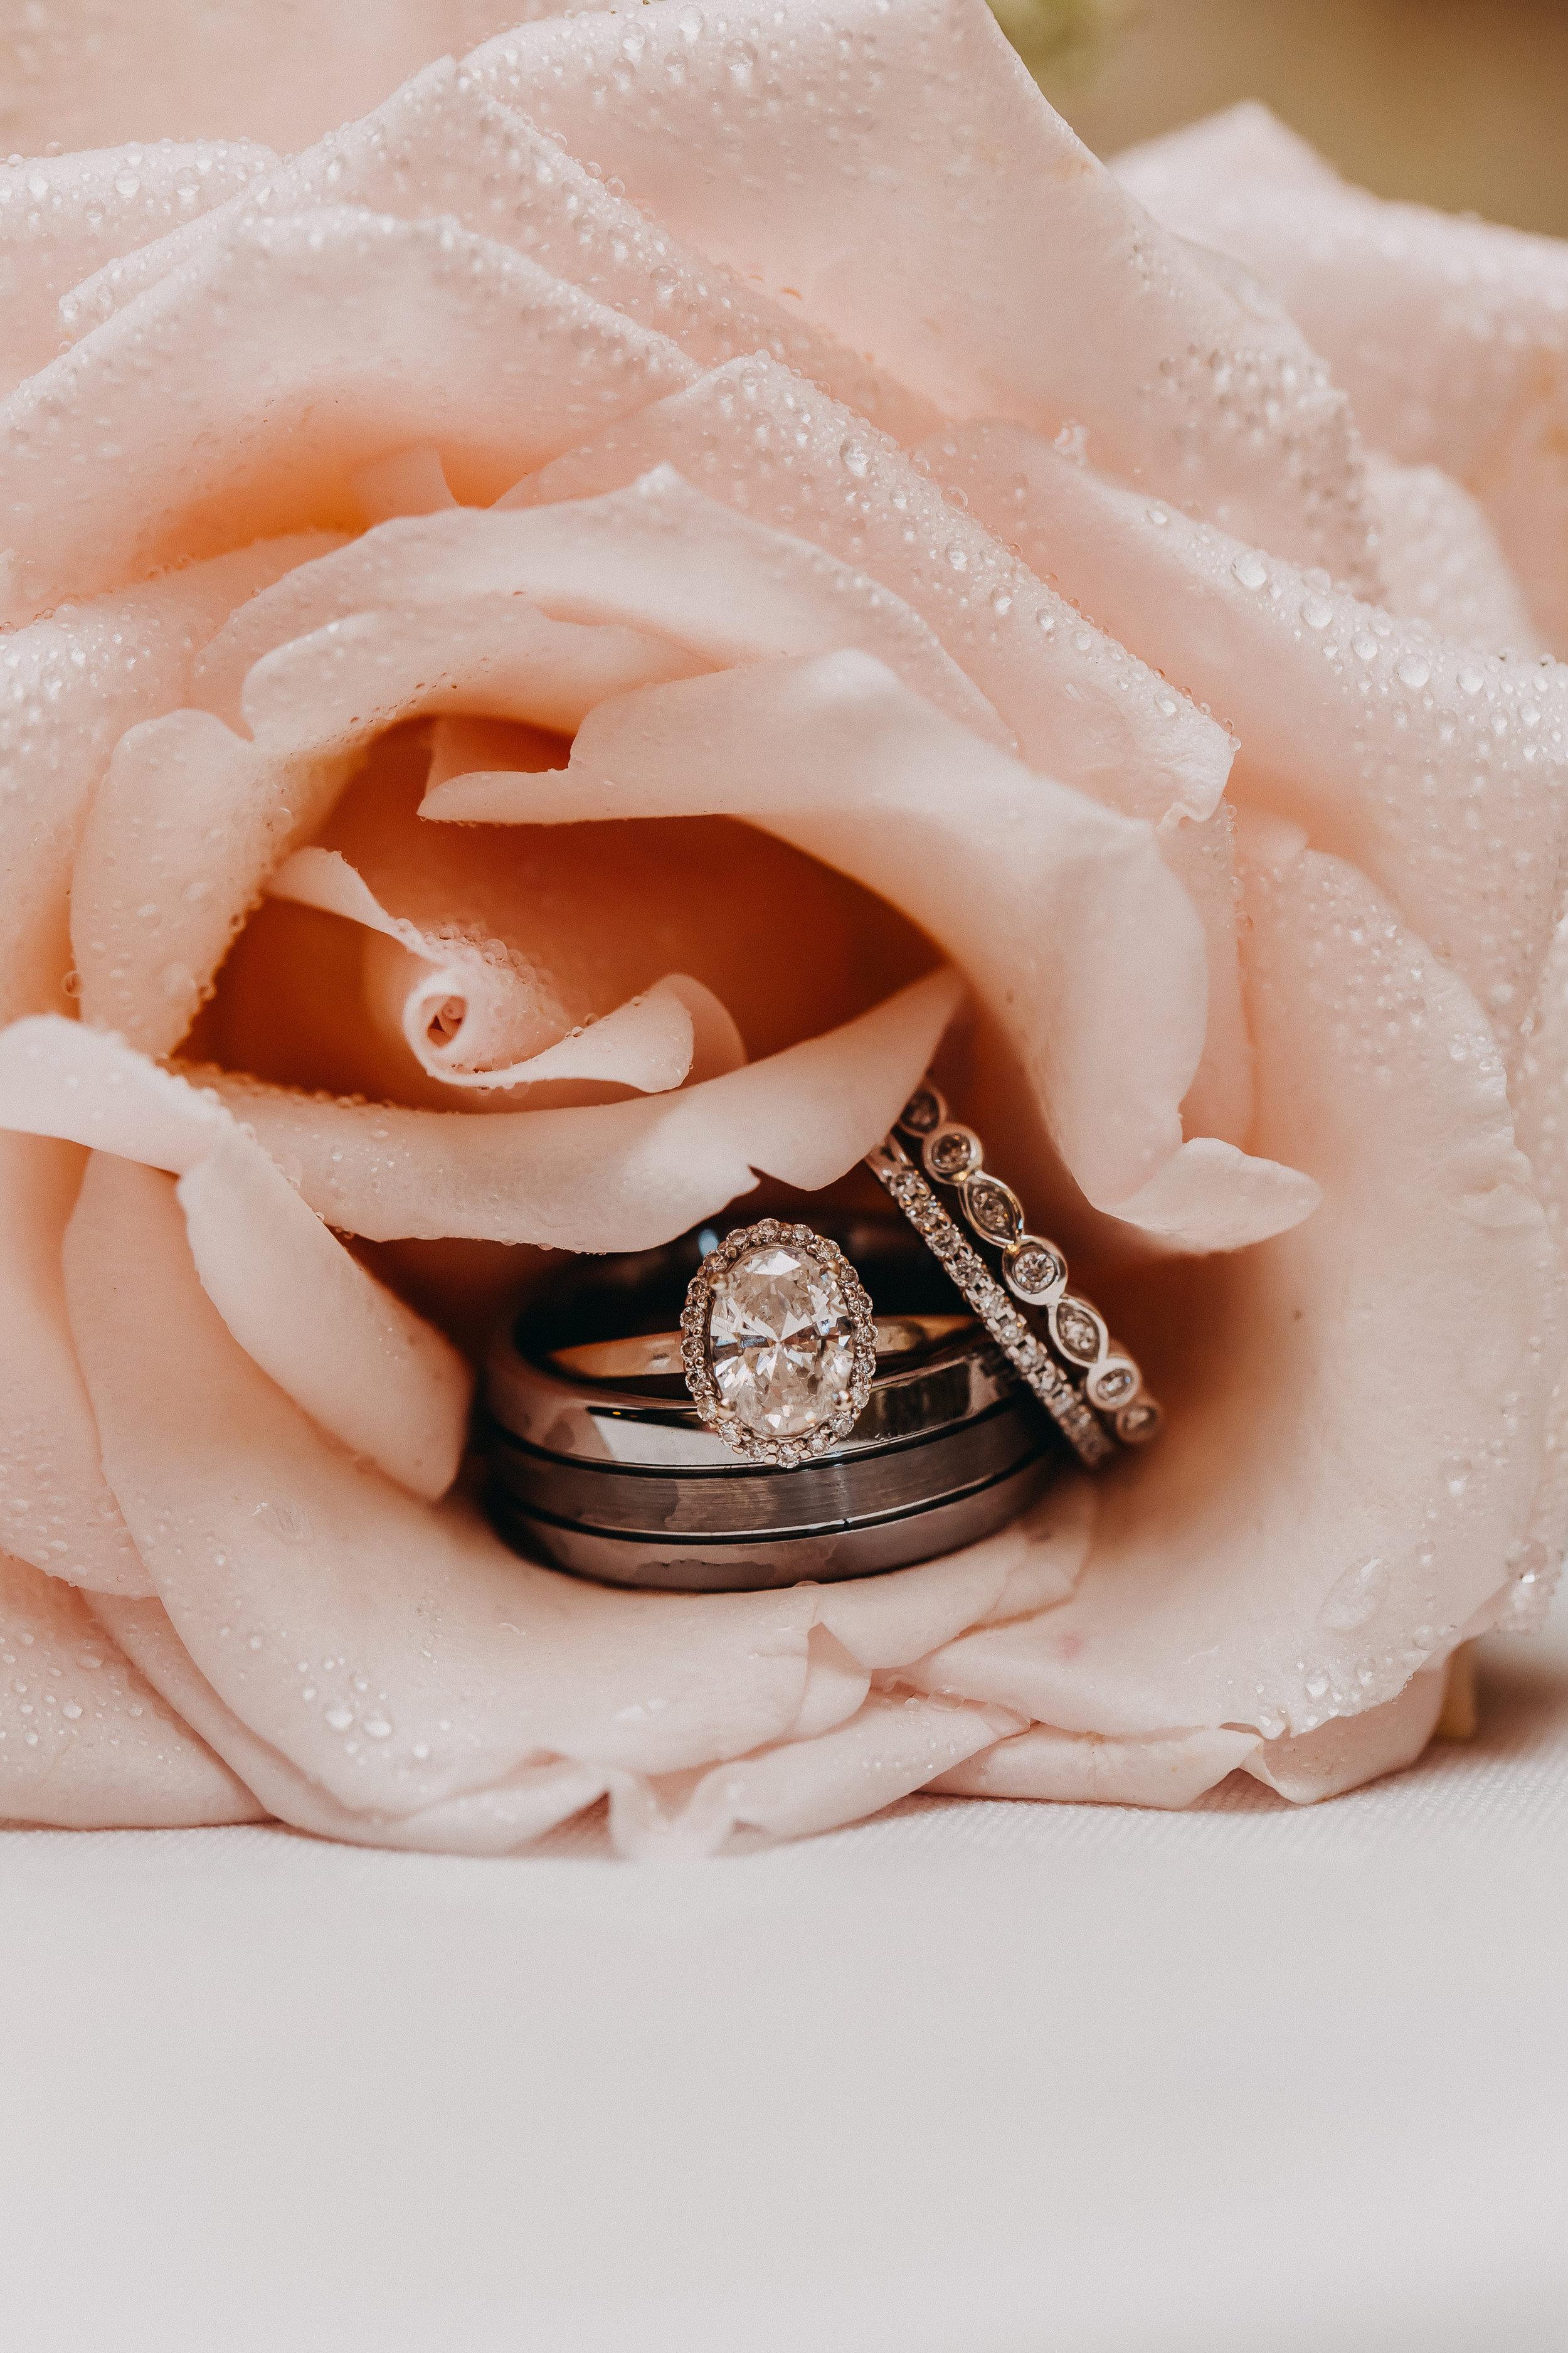 Solitaire Engagement Ring - Florida Estate Wedding - Powel Crowley Estate Wedding